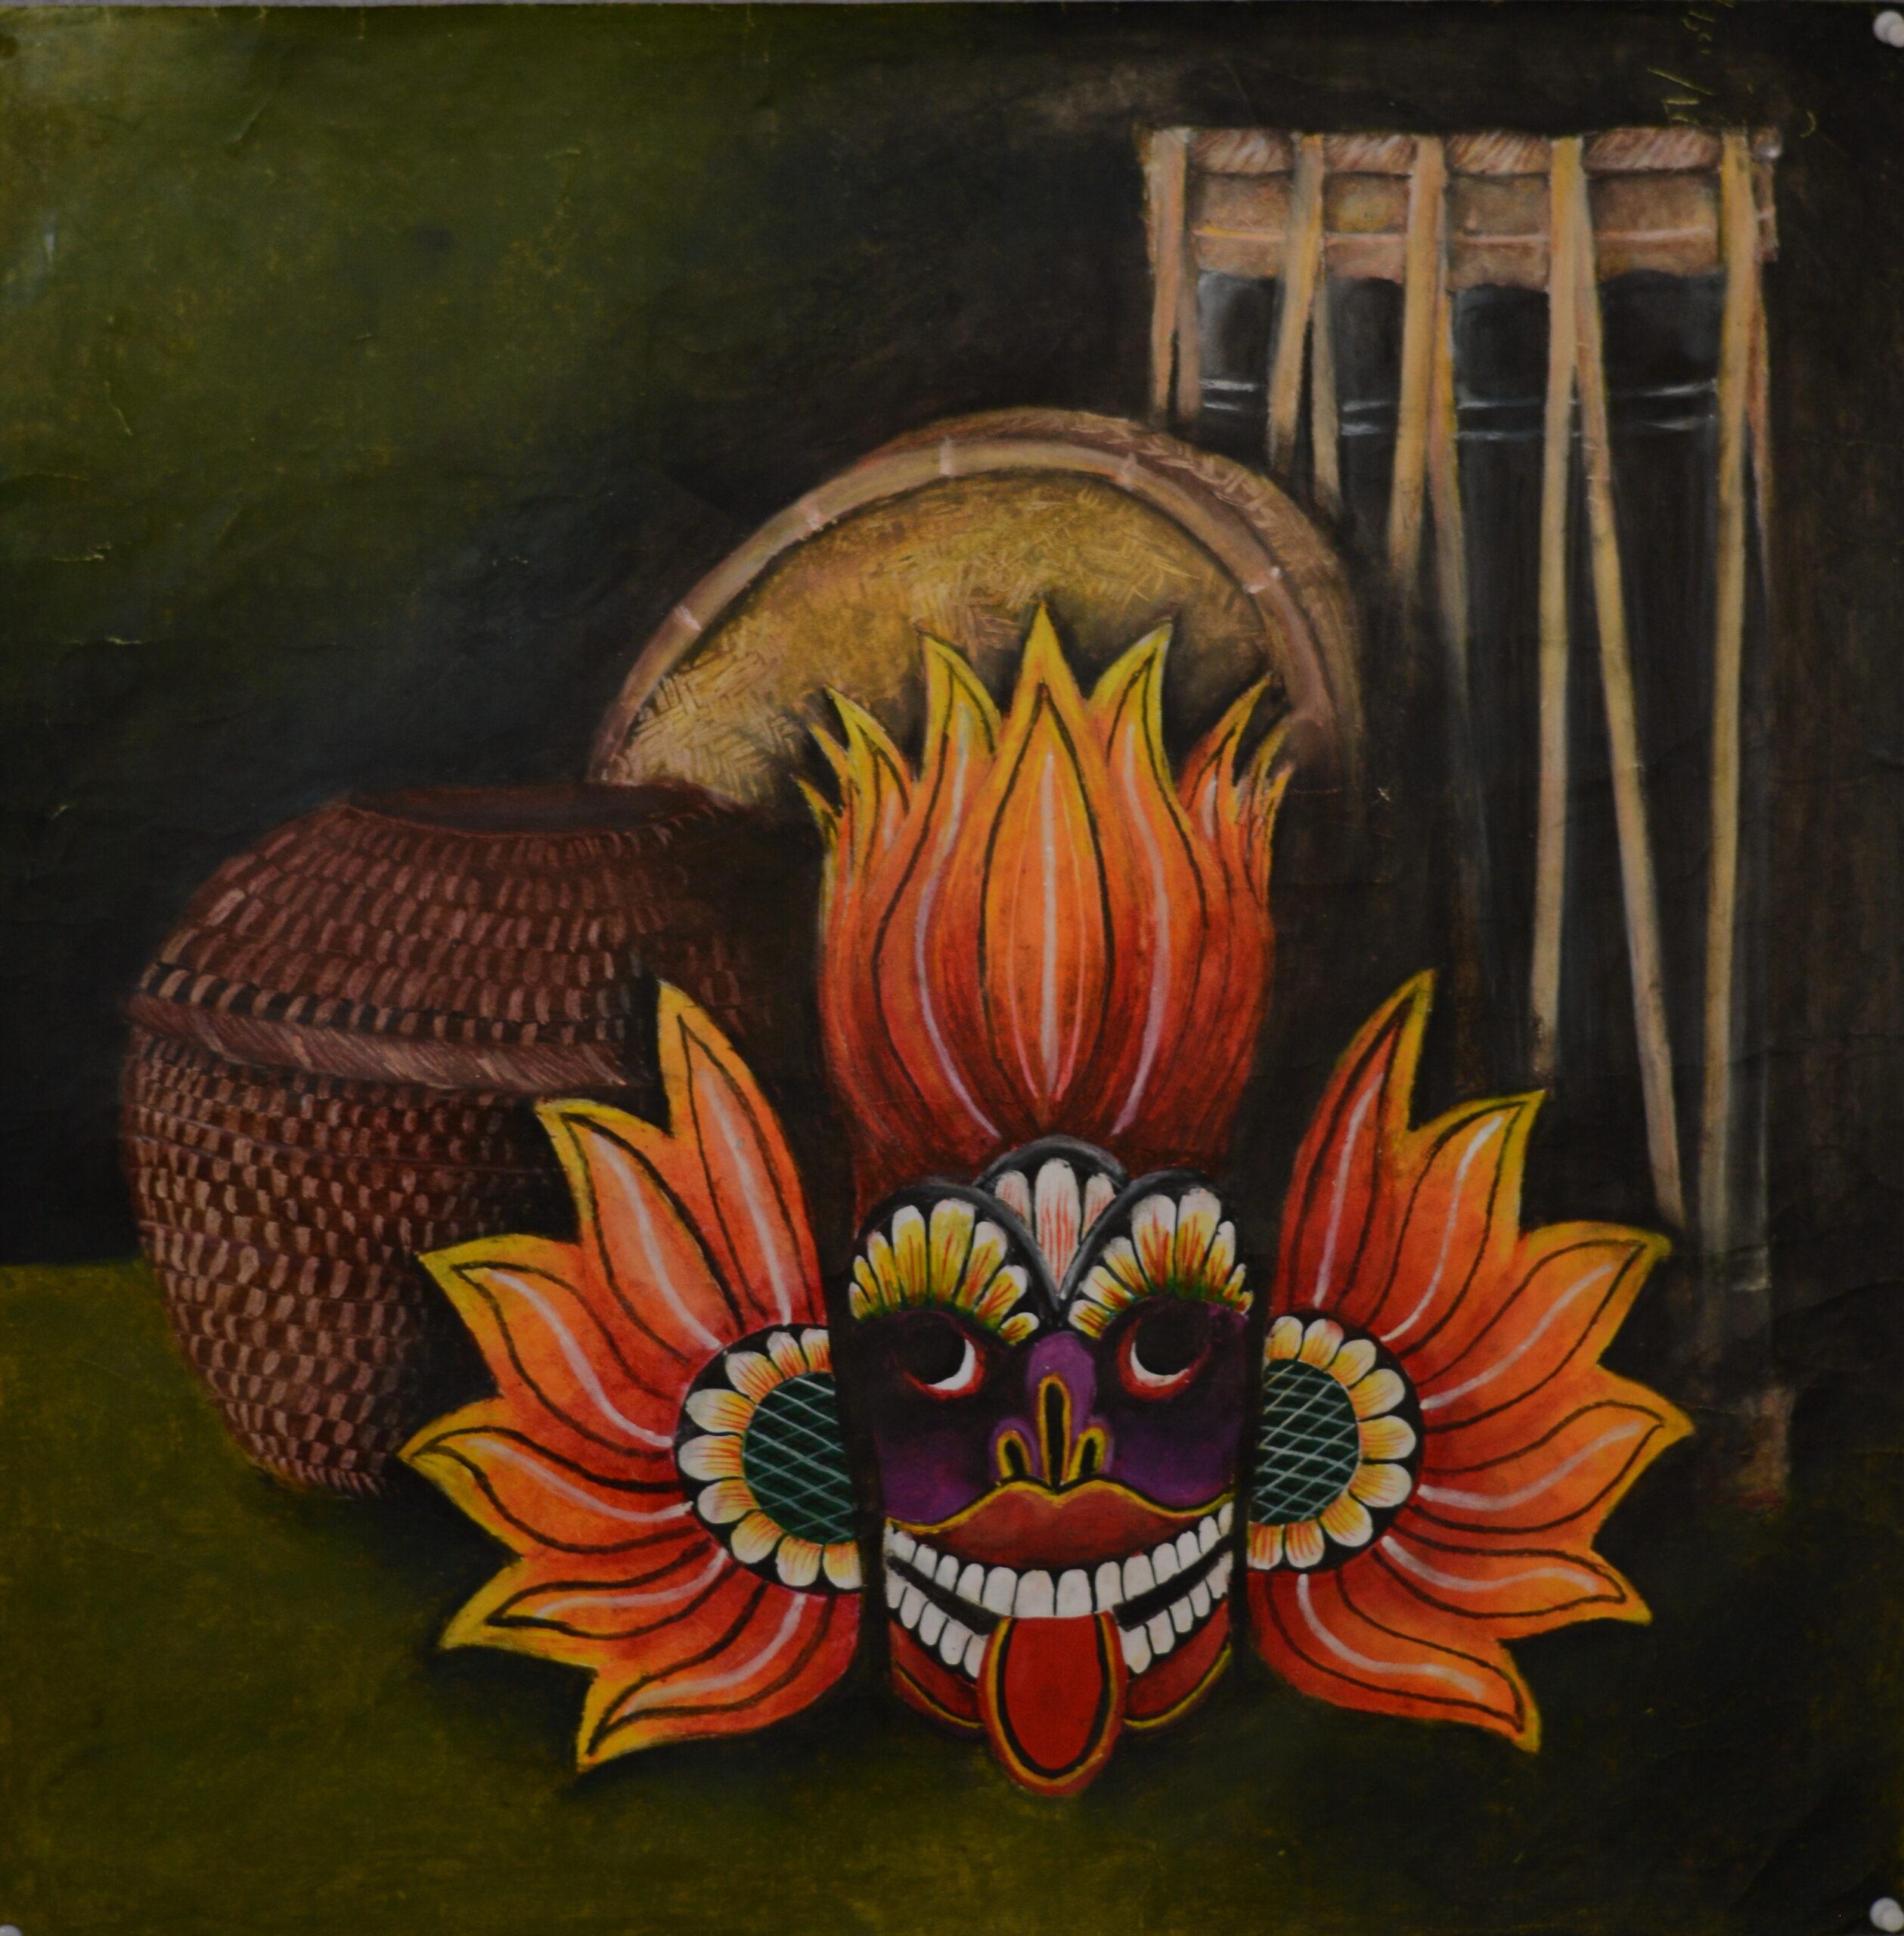 A few items that are representing the uniqueness of Sri Lanka_D. A. Ruwanara Saminthi